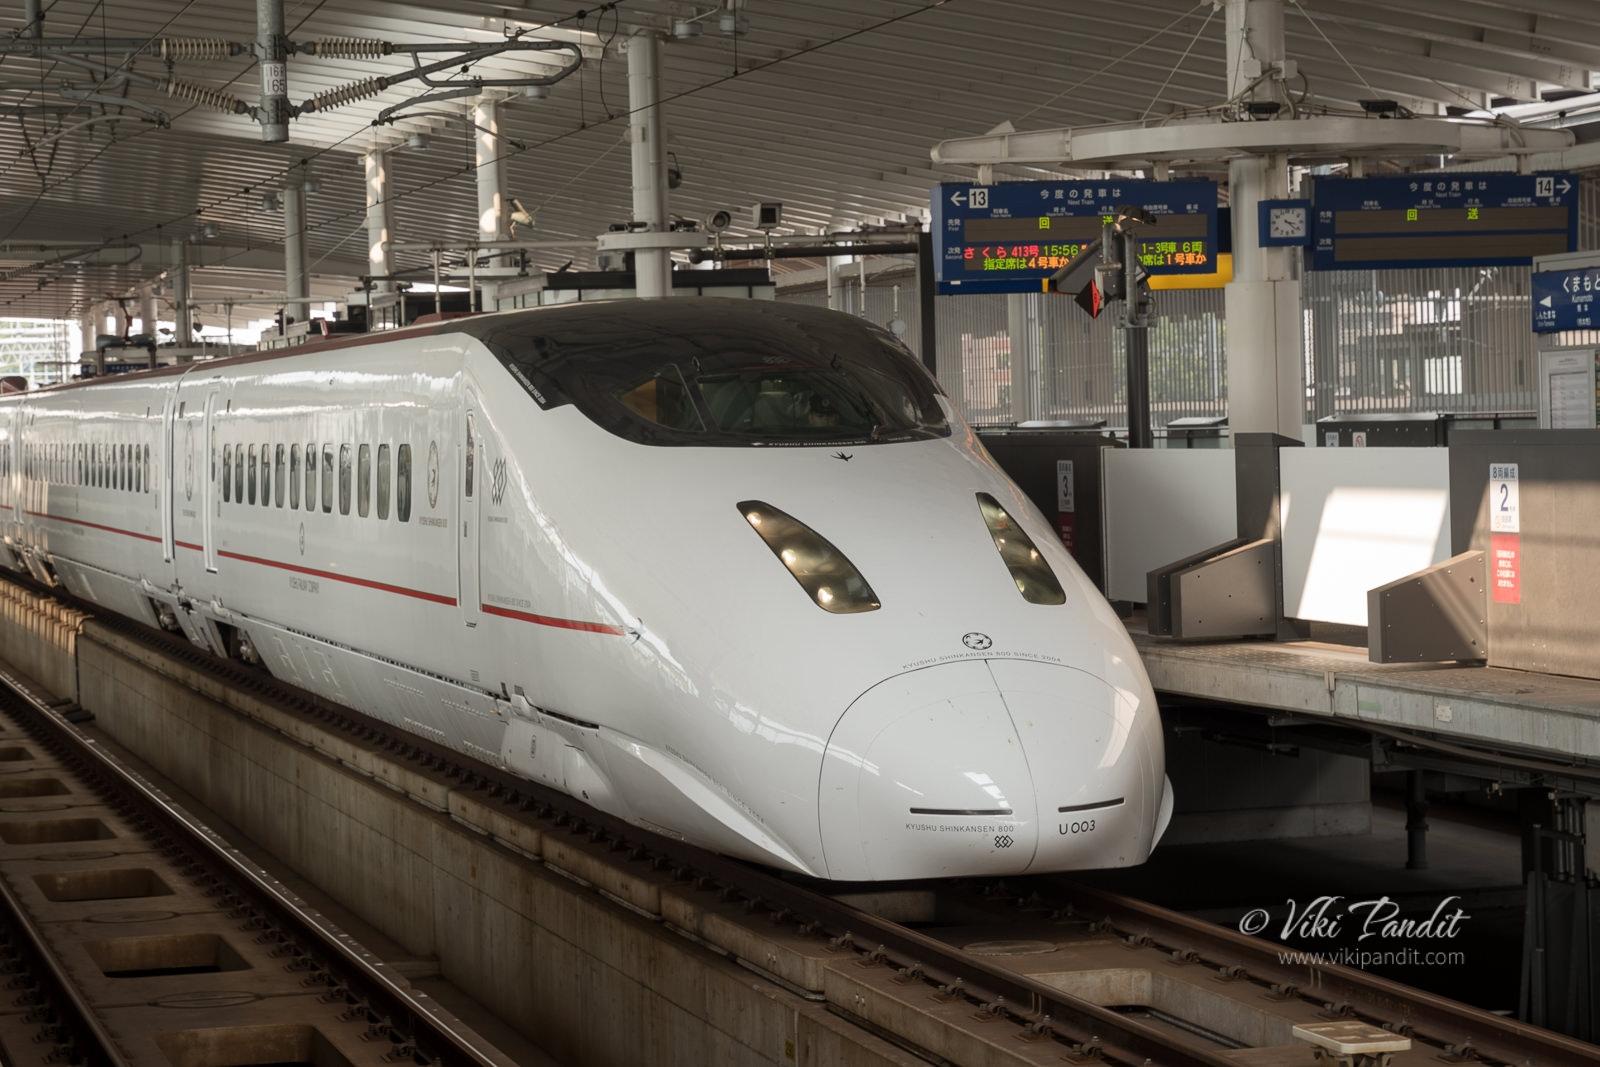 The Hikari Shinkansen